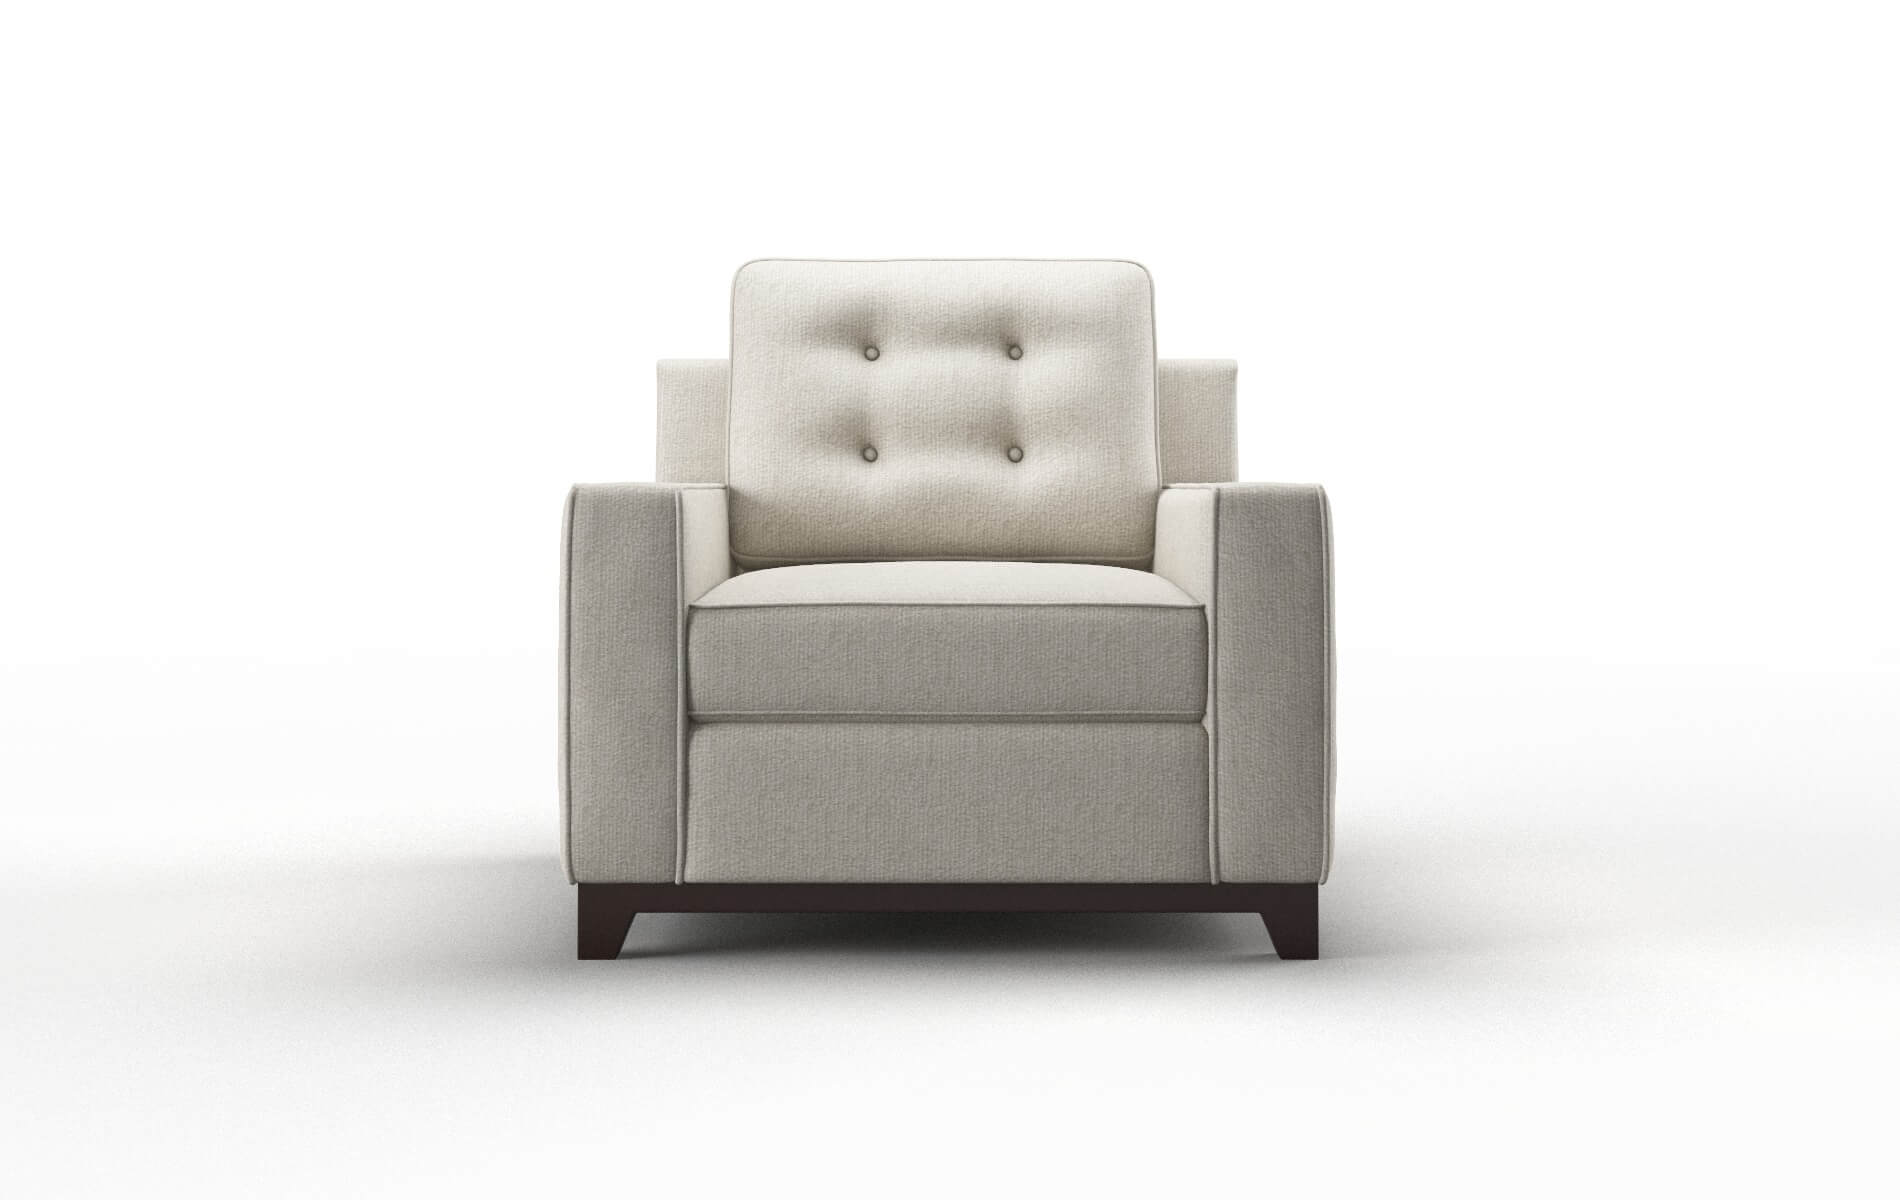 Alexandria Sasha Linen chair espresso legs